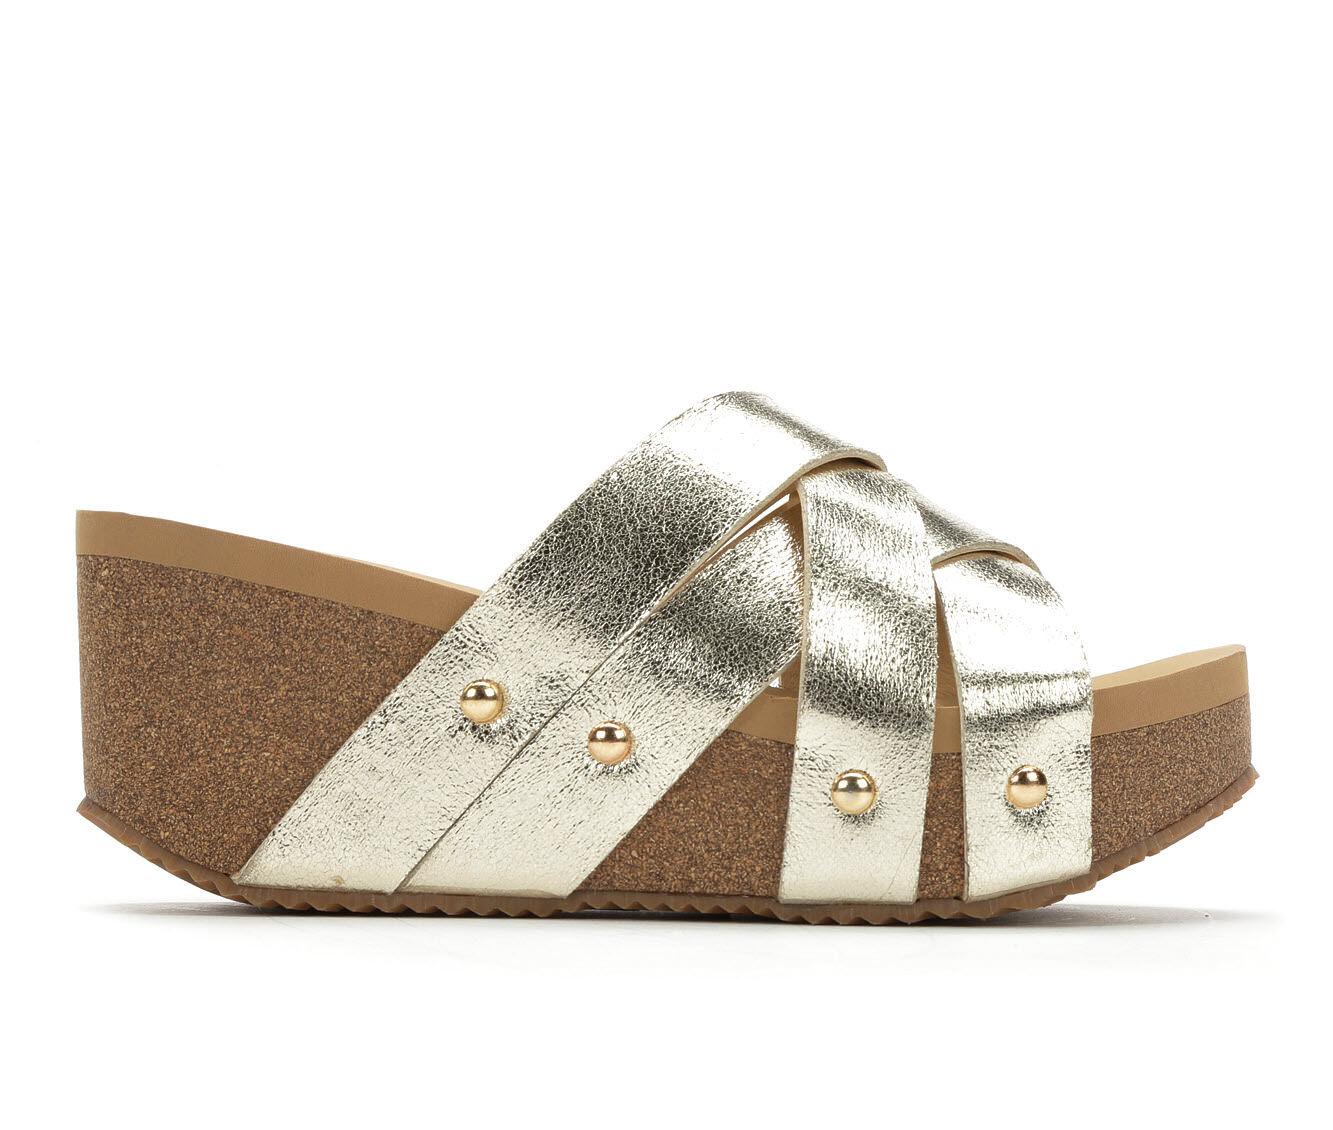 buy new style Women's Volatile Ethereal Platform Wedge Slide Sandals Gold